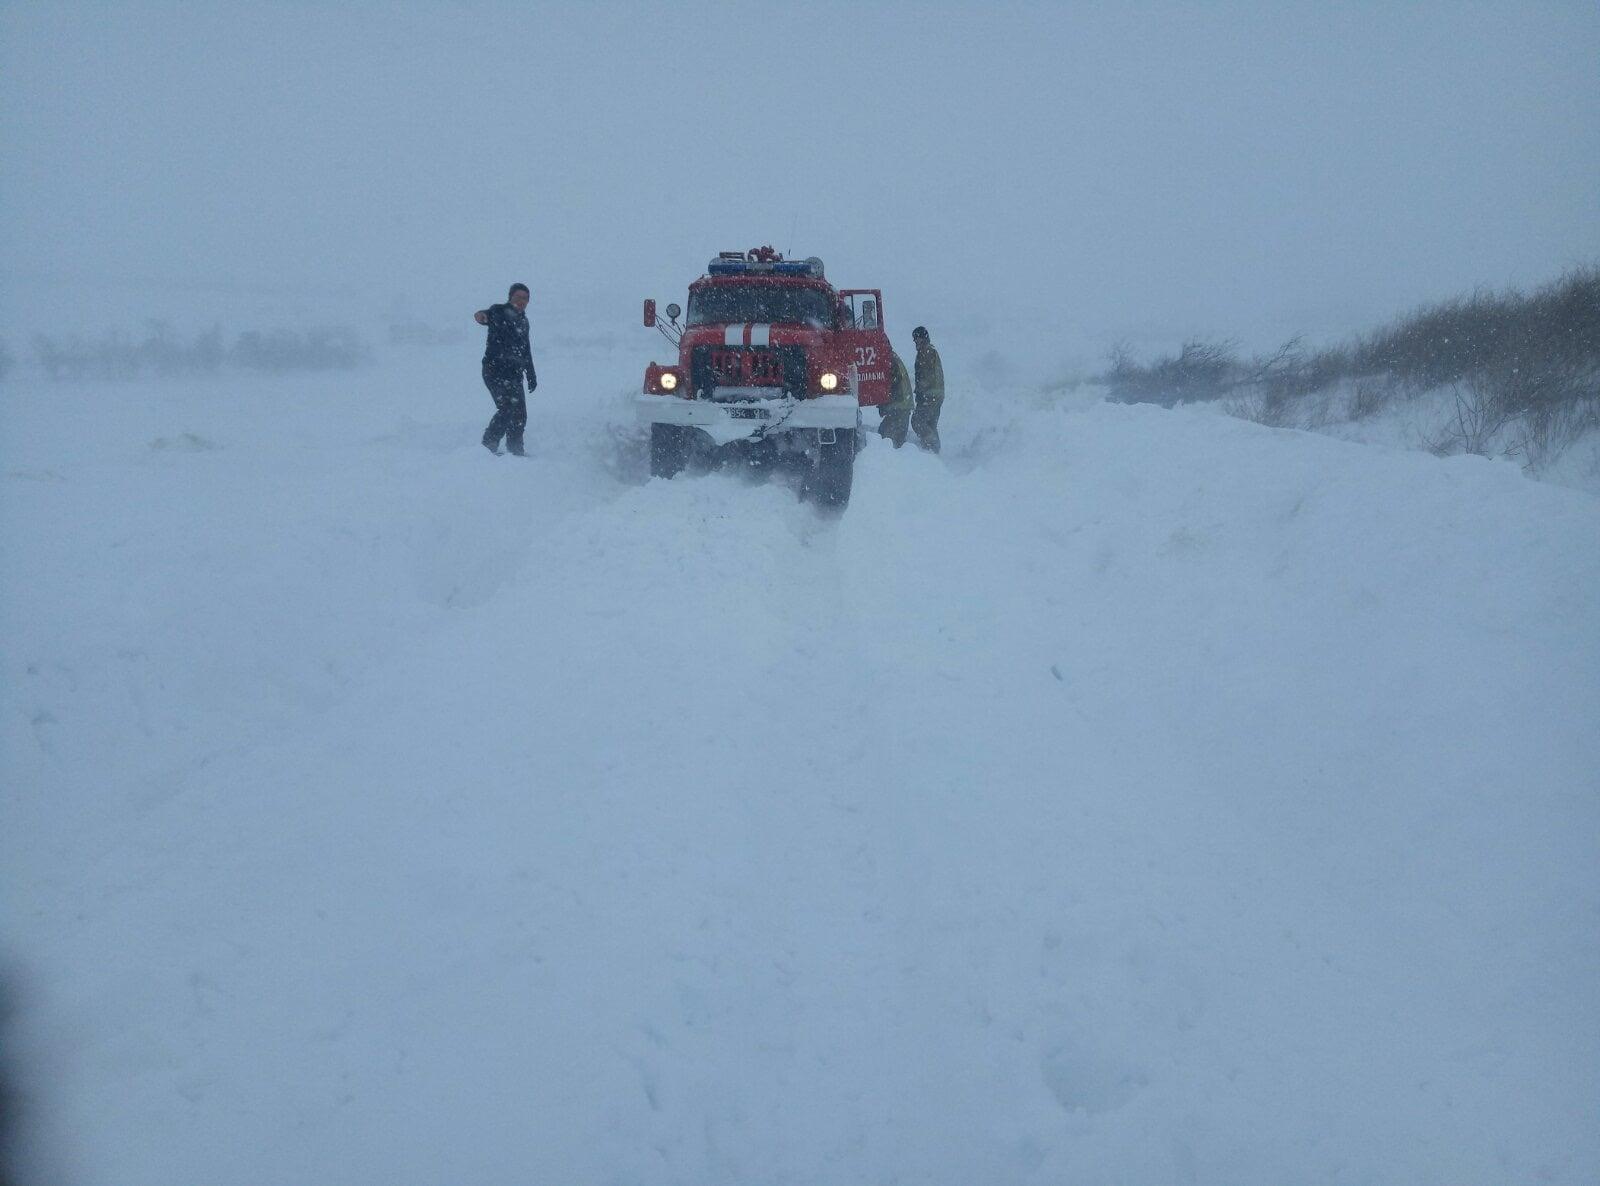 Сотрудники ГСЧС спасают роженицу из снежного плена